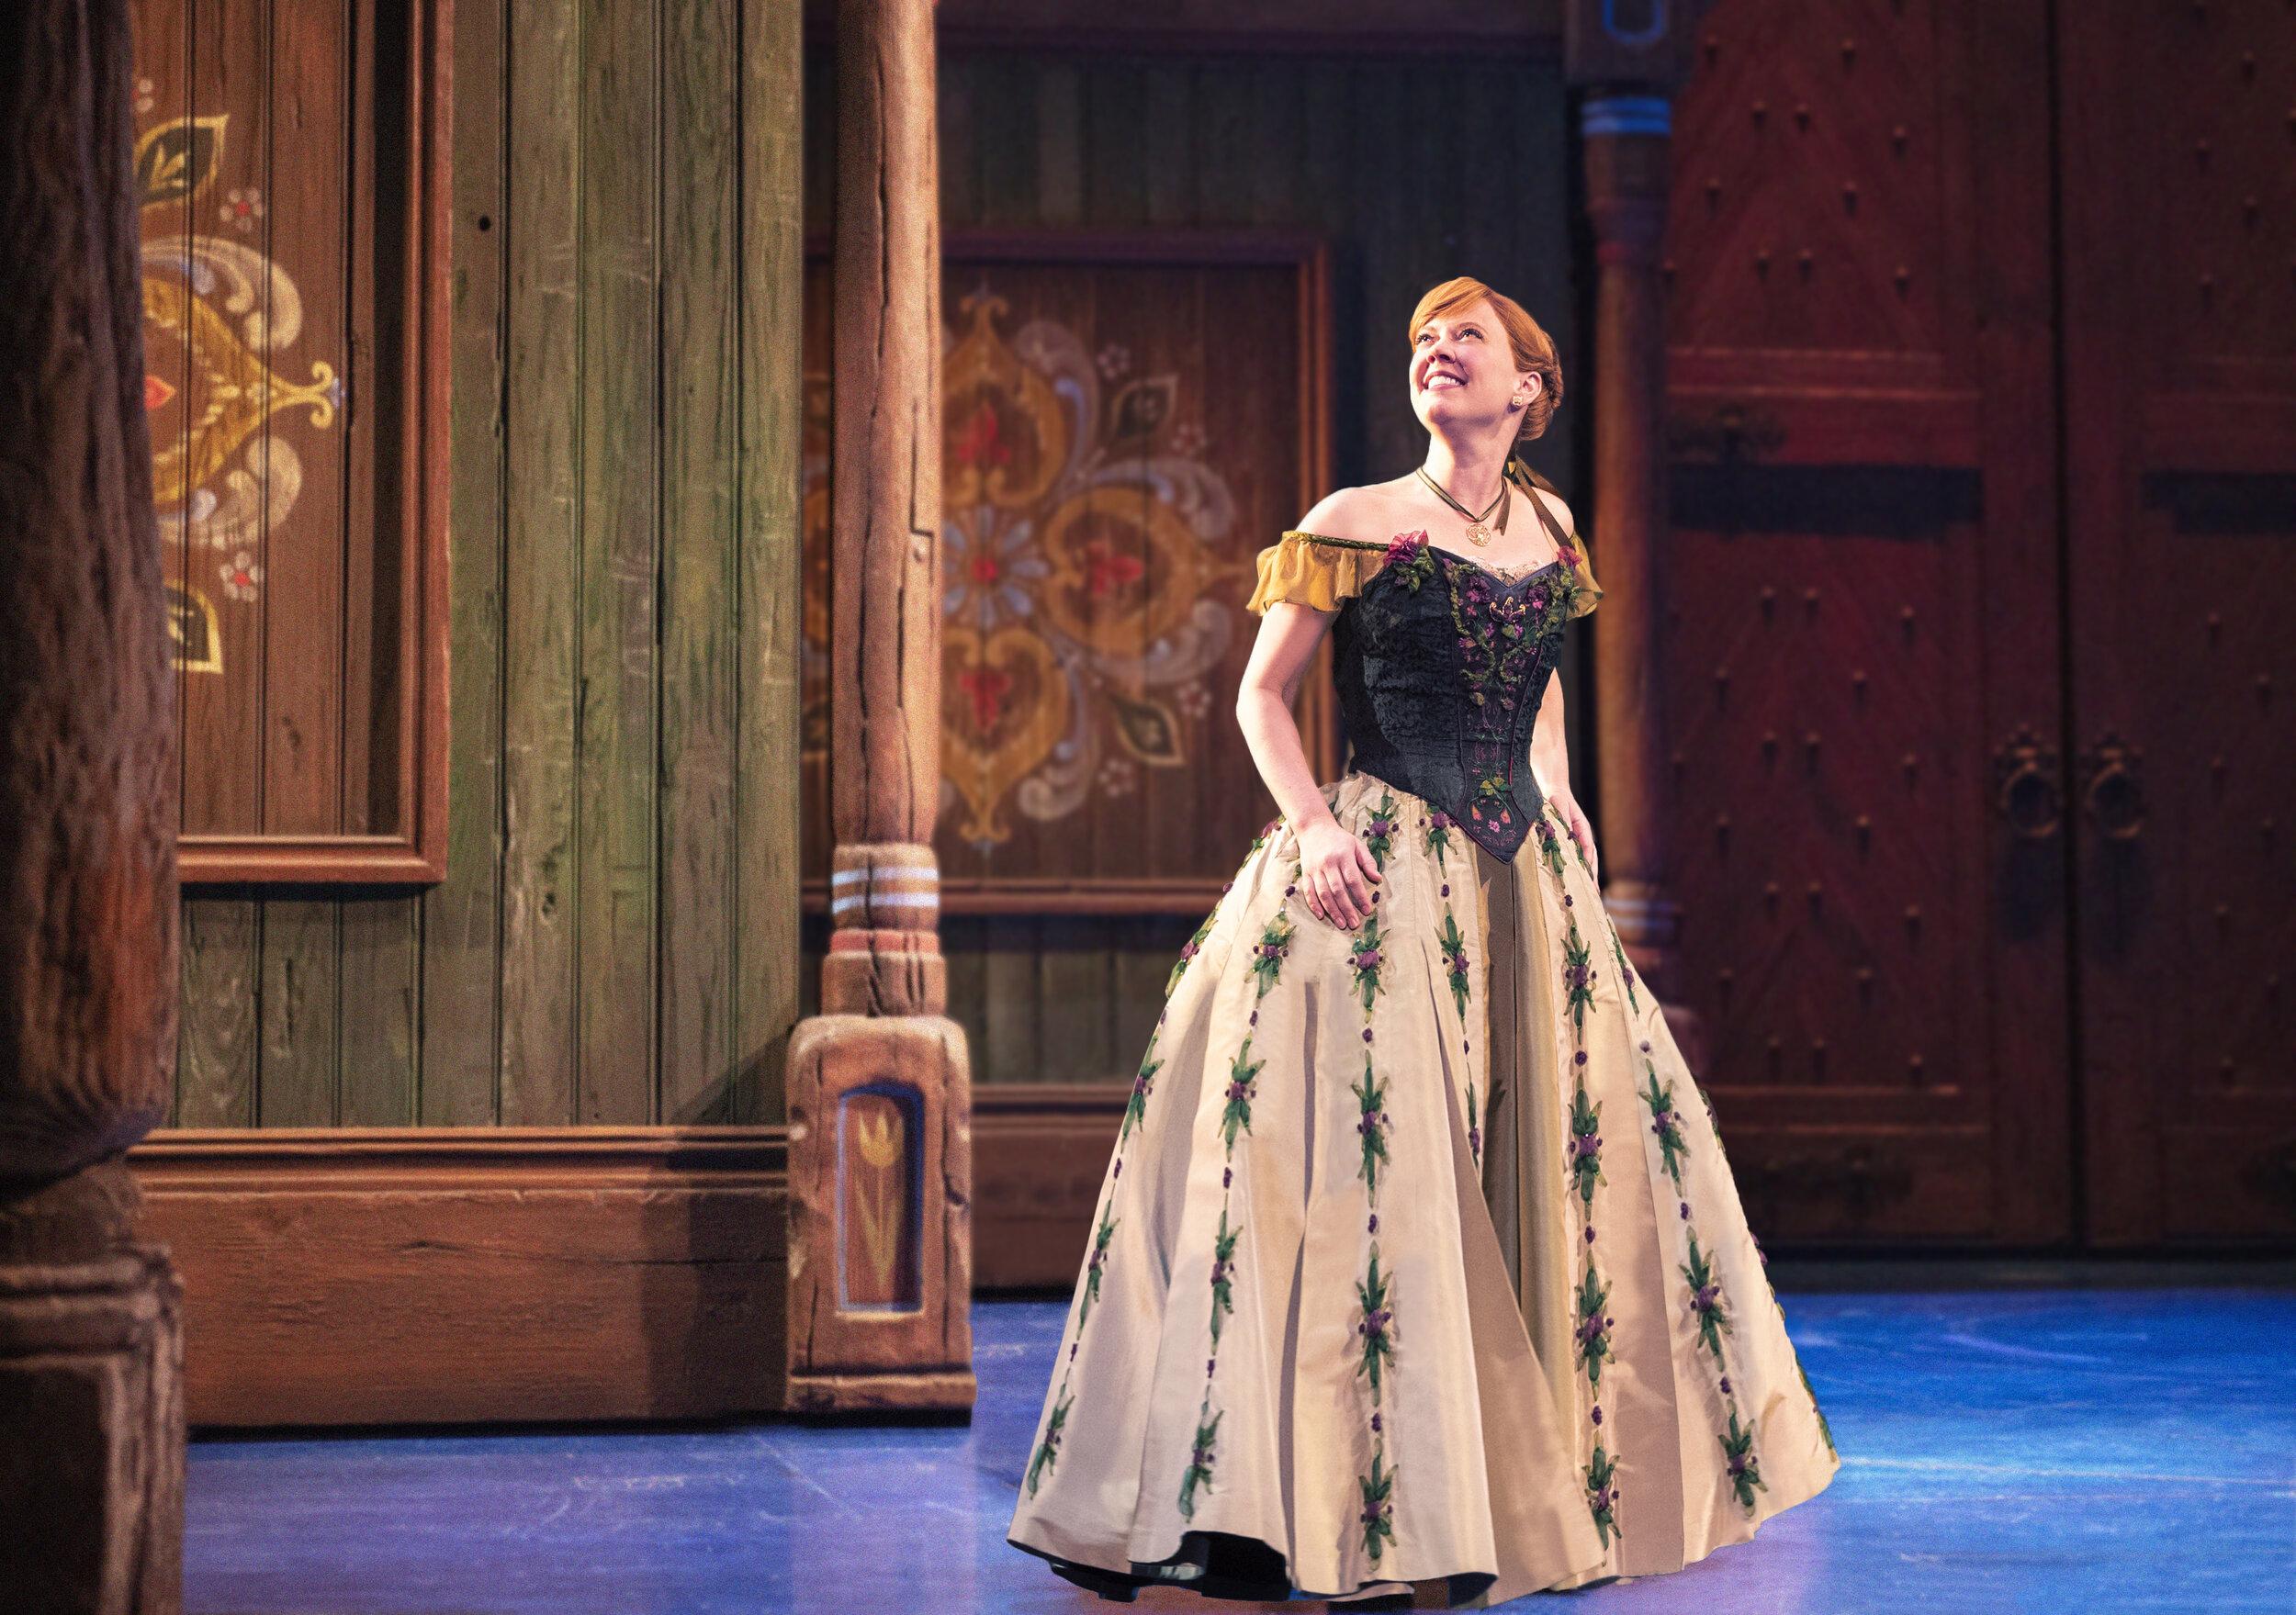 2-Patti Murin as Anna in Frozen Broadway photo by Deen van Meer.jpg